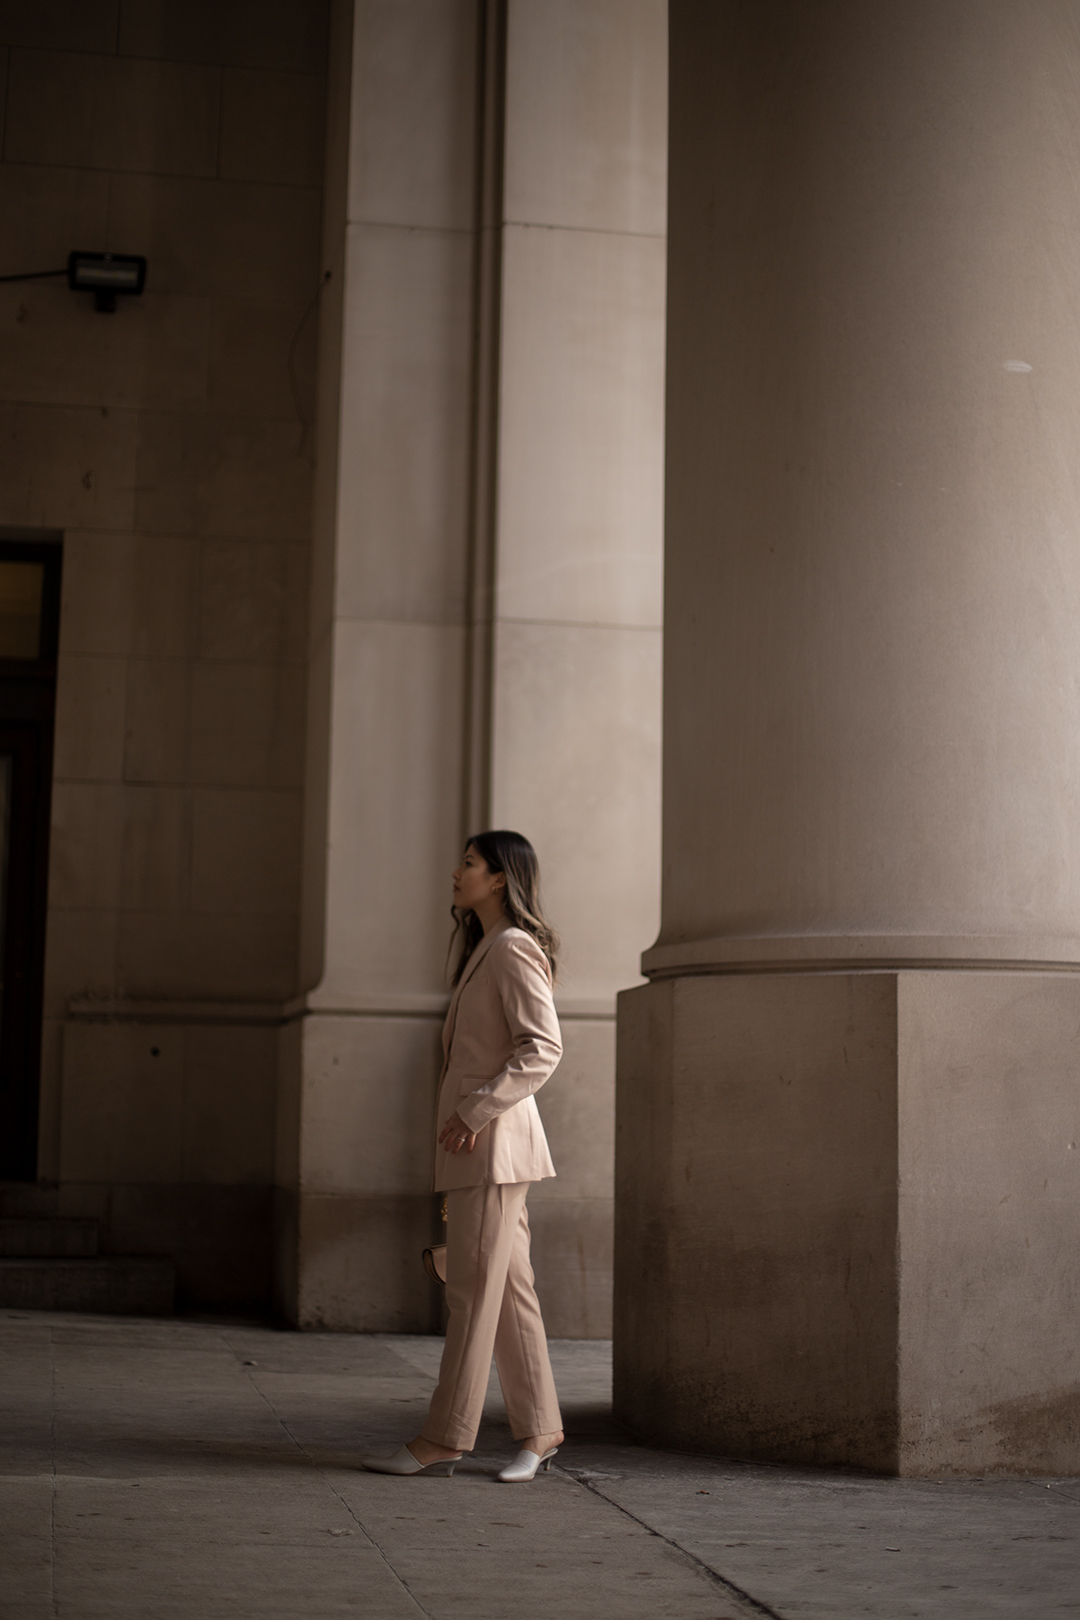 Mango-Suit-Chloe-Nile-21.jpg